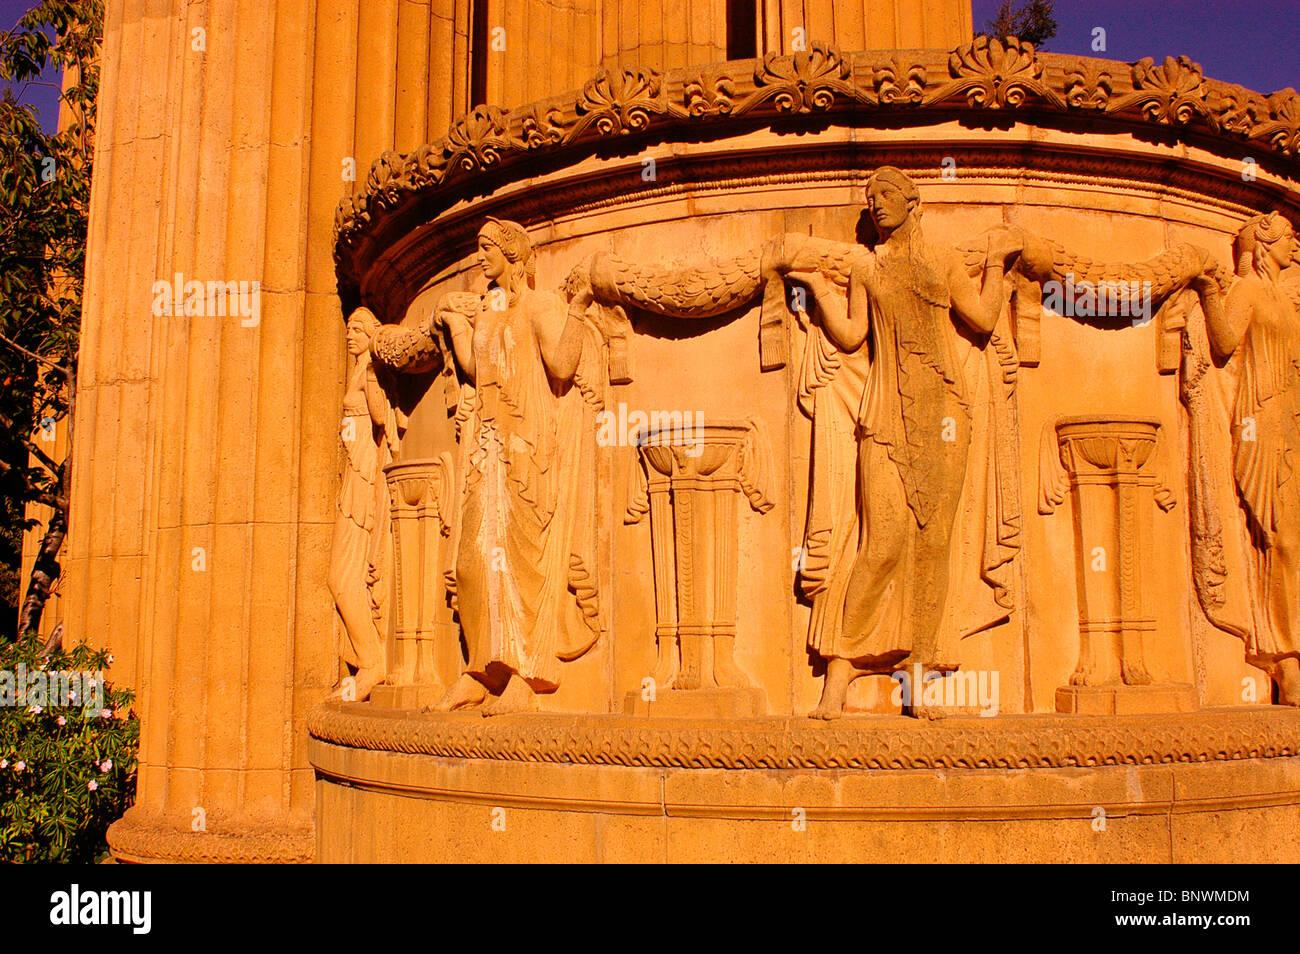 Palast der schönen Künste Stockbild